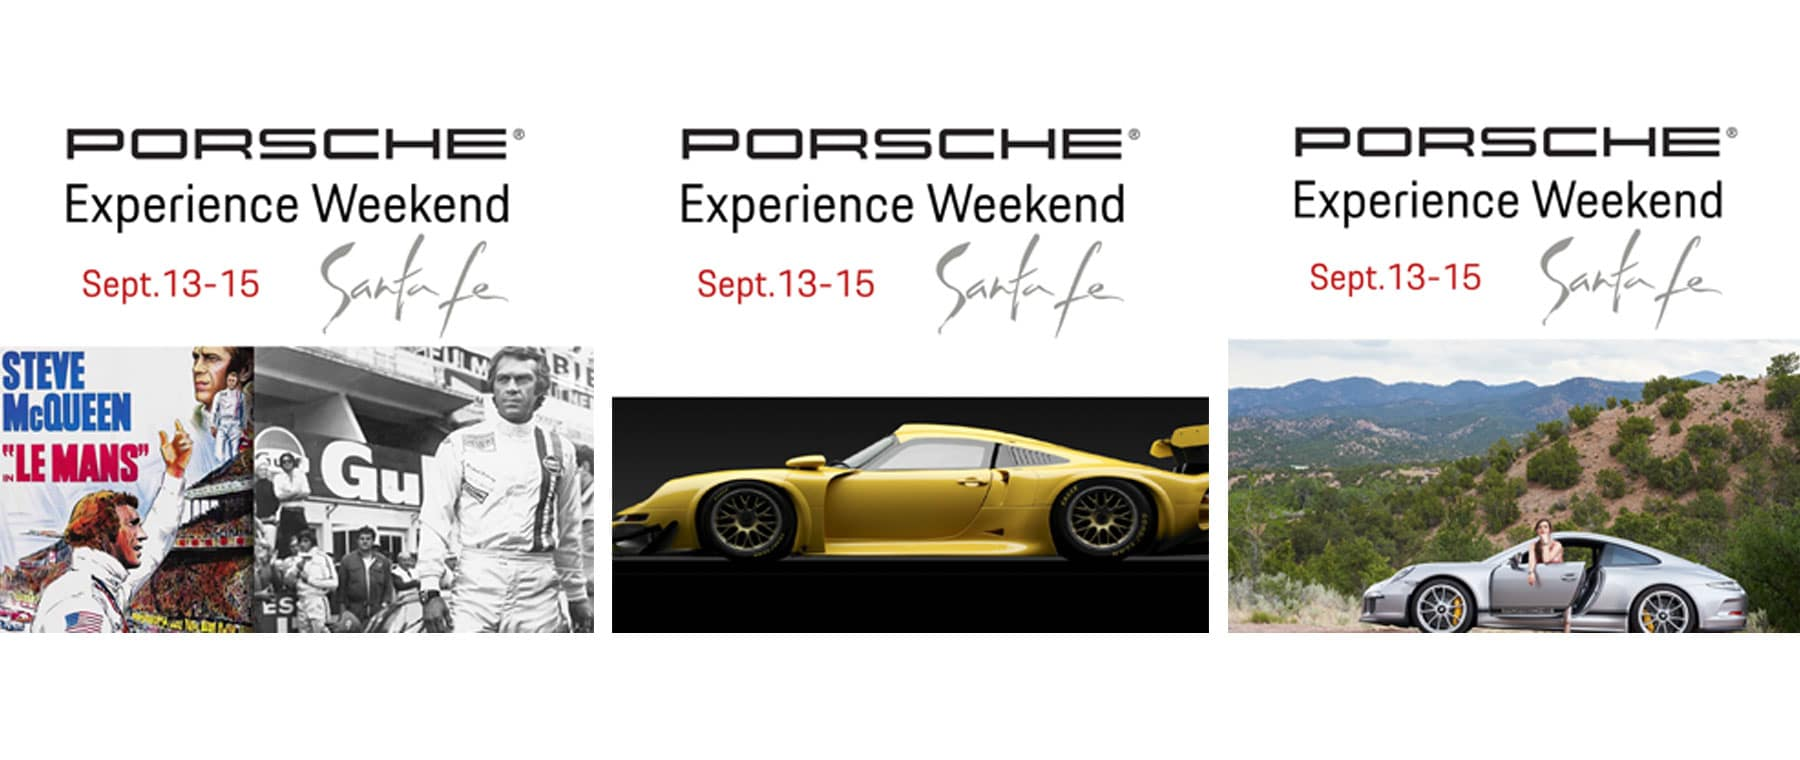 Porsche Experience Weekend